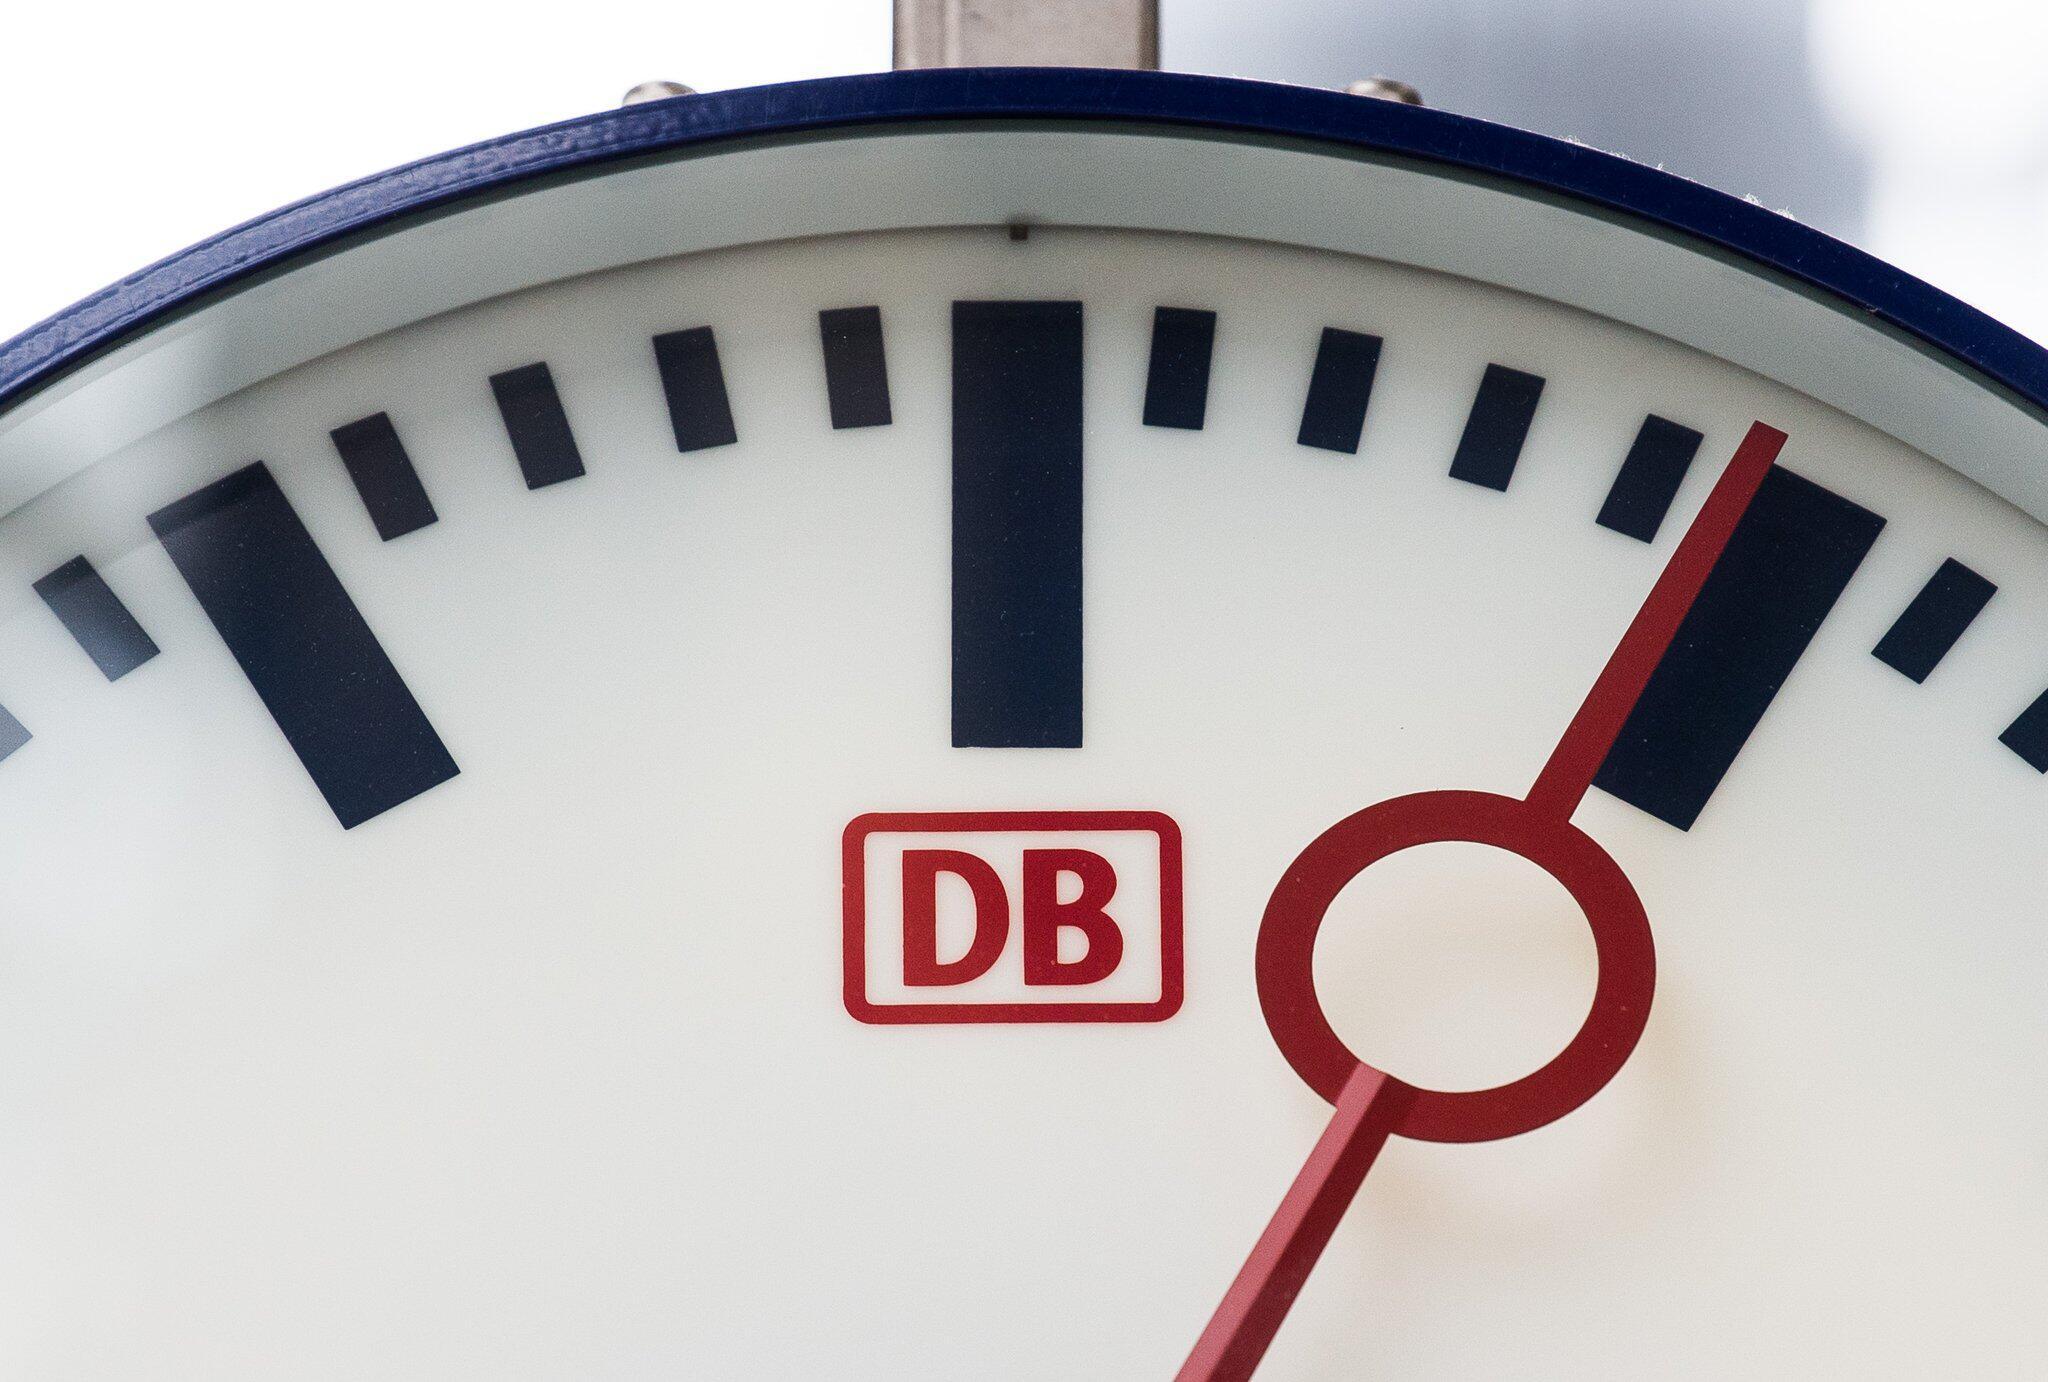 Scheuer kündigt neues Bahn-Krisentreffen am Donnerstag an